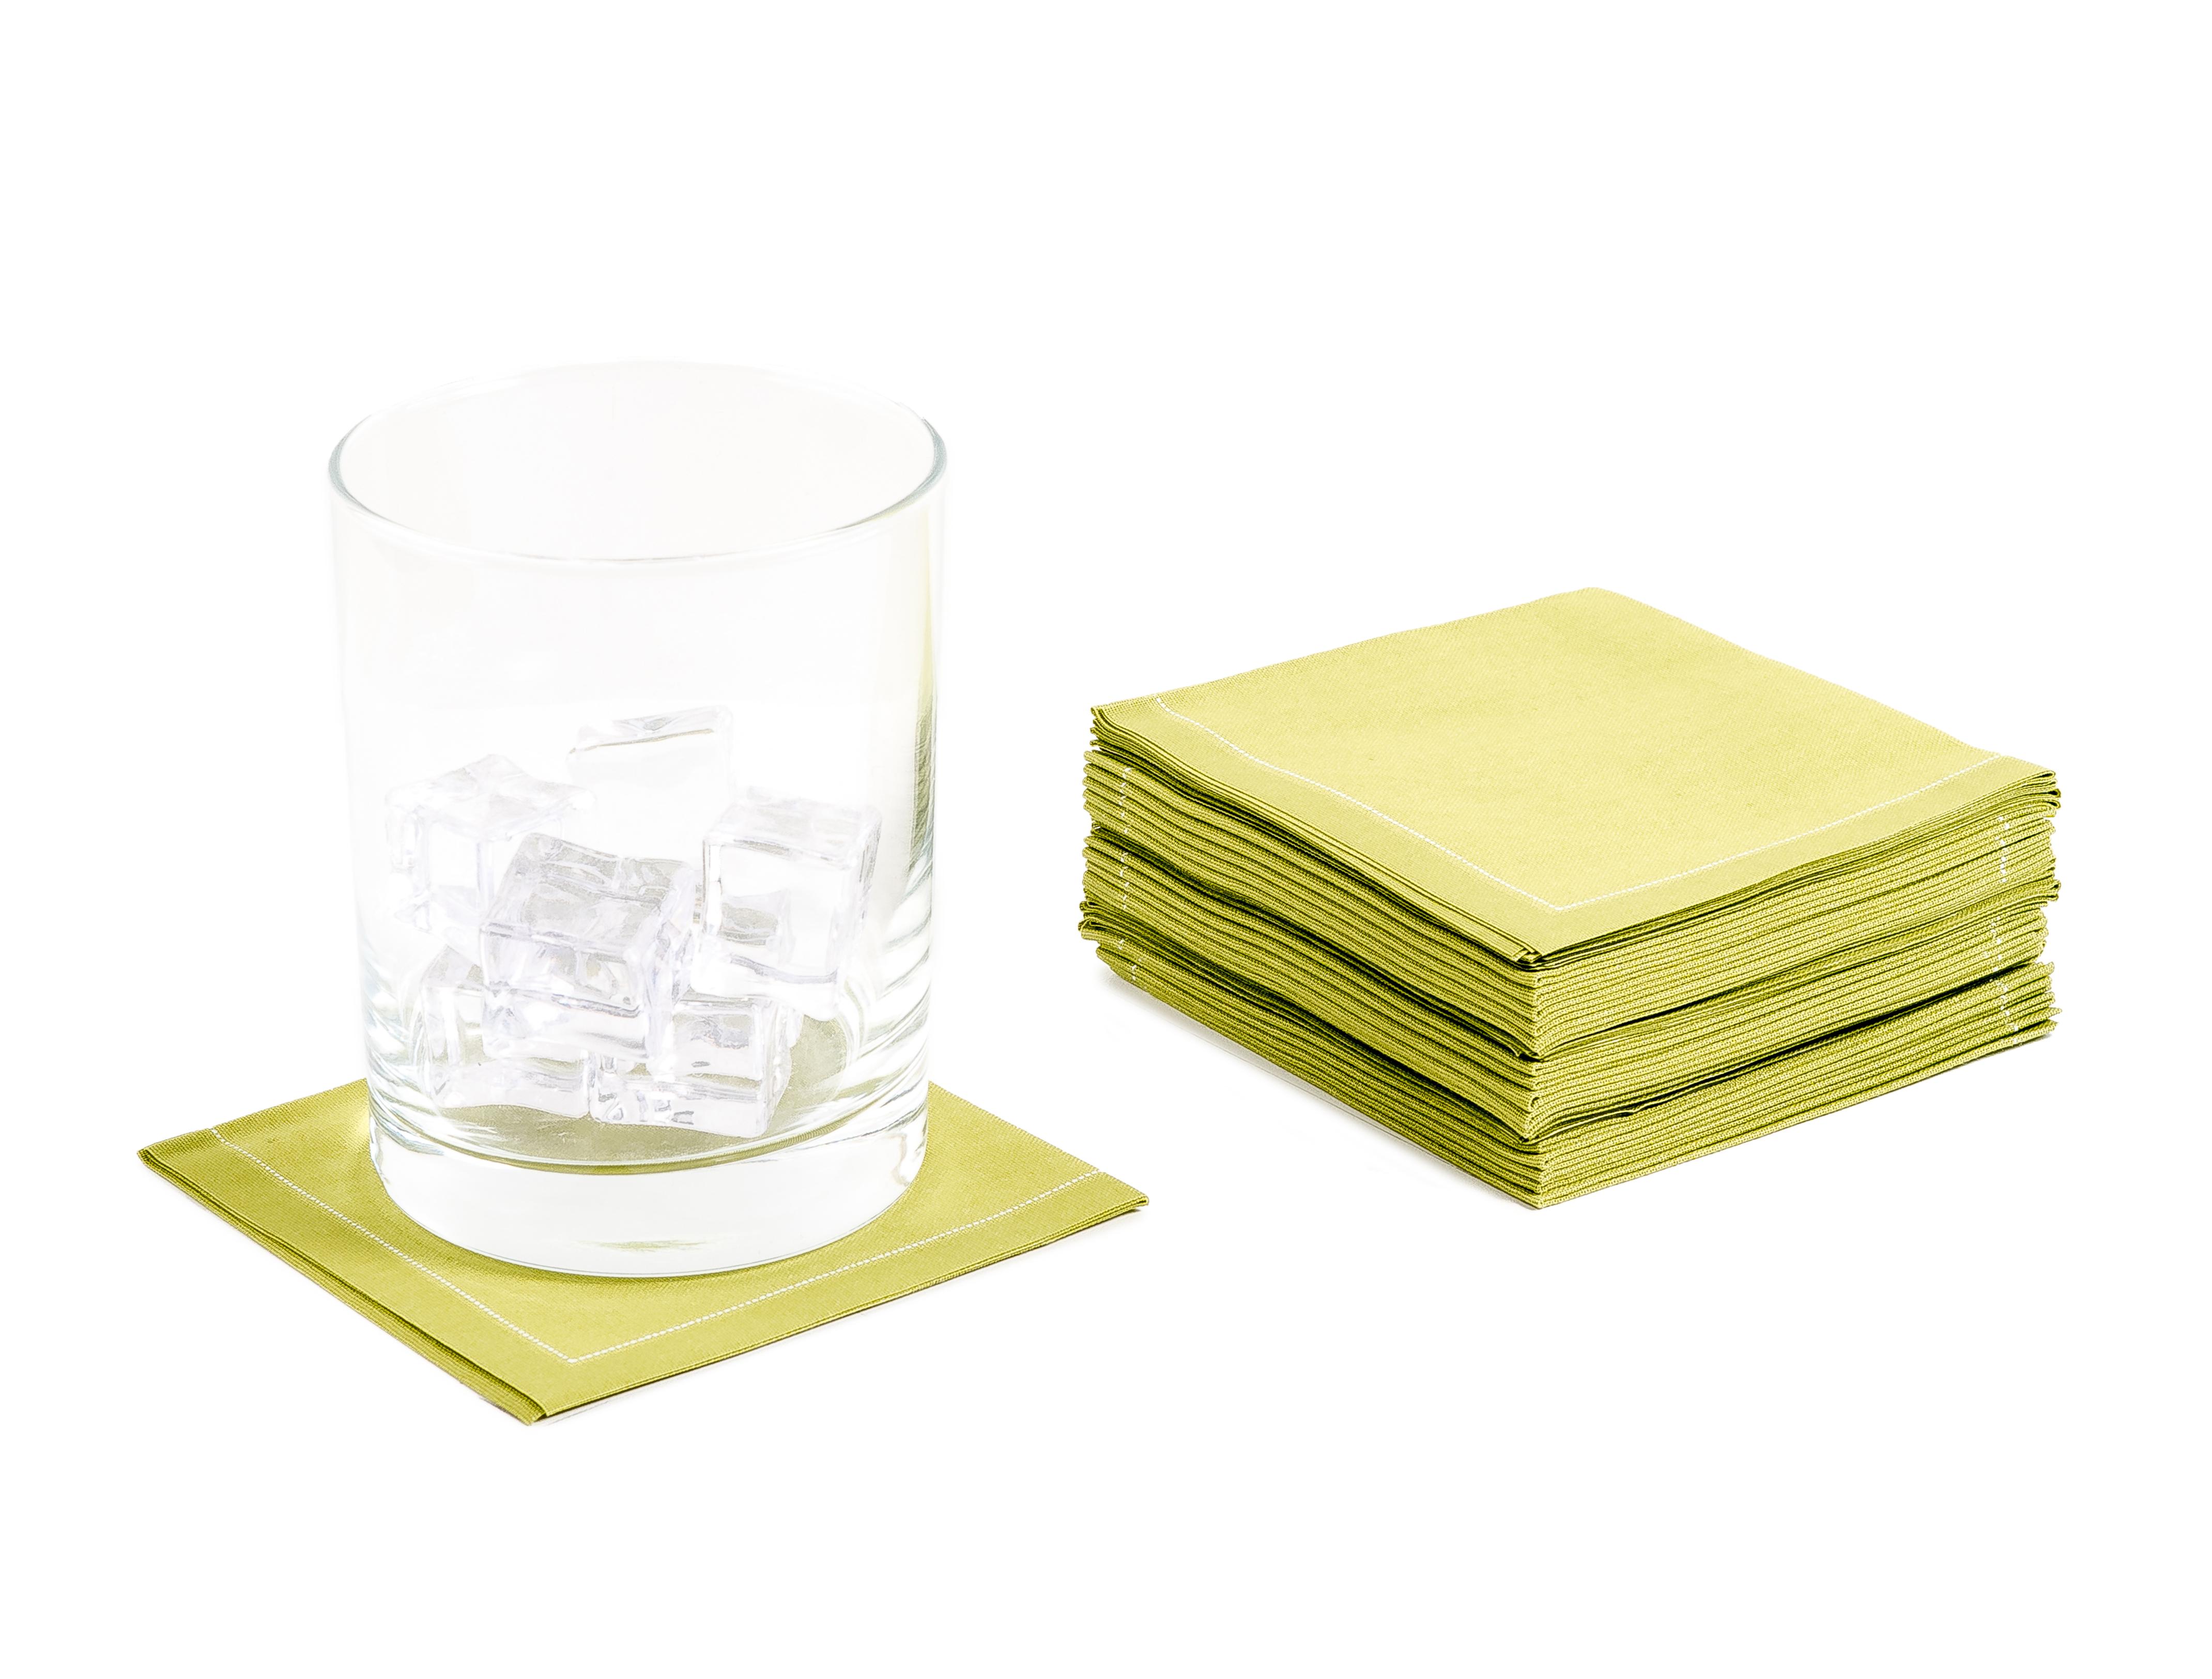 "Pear Cotton 1/4 Fold Cocktail - 8"" x 8"" (folded 4"" x 4"") - 30 units"